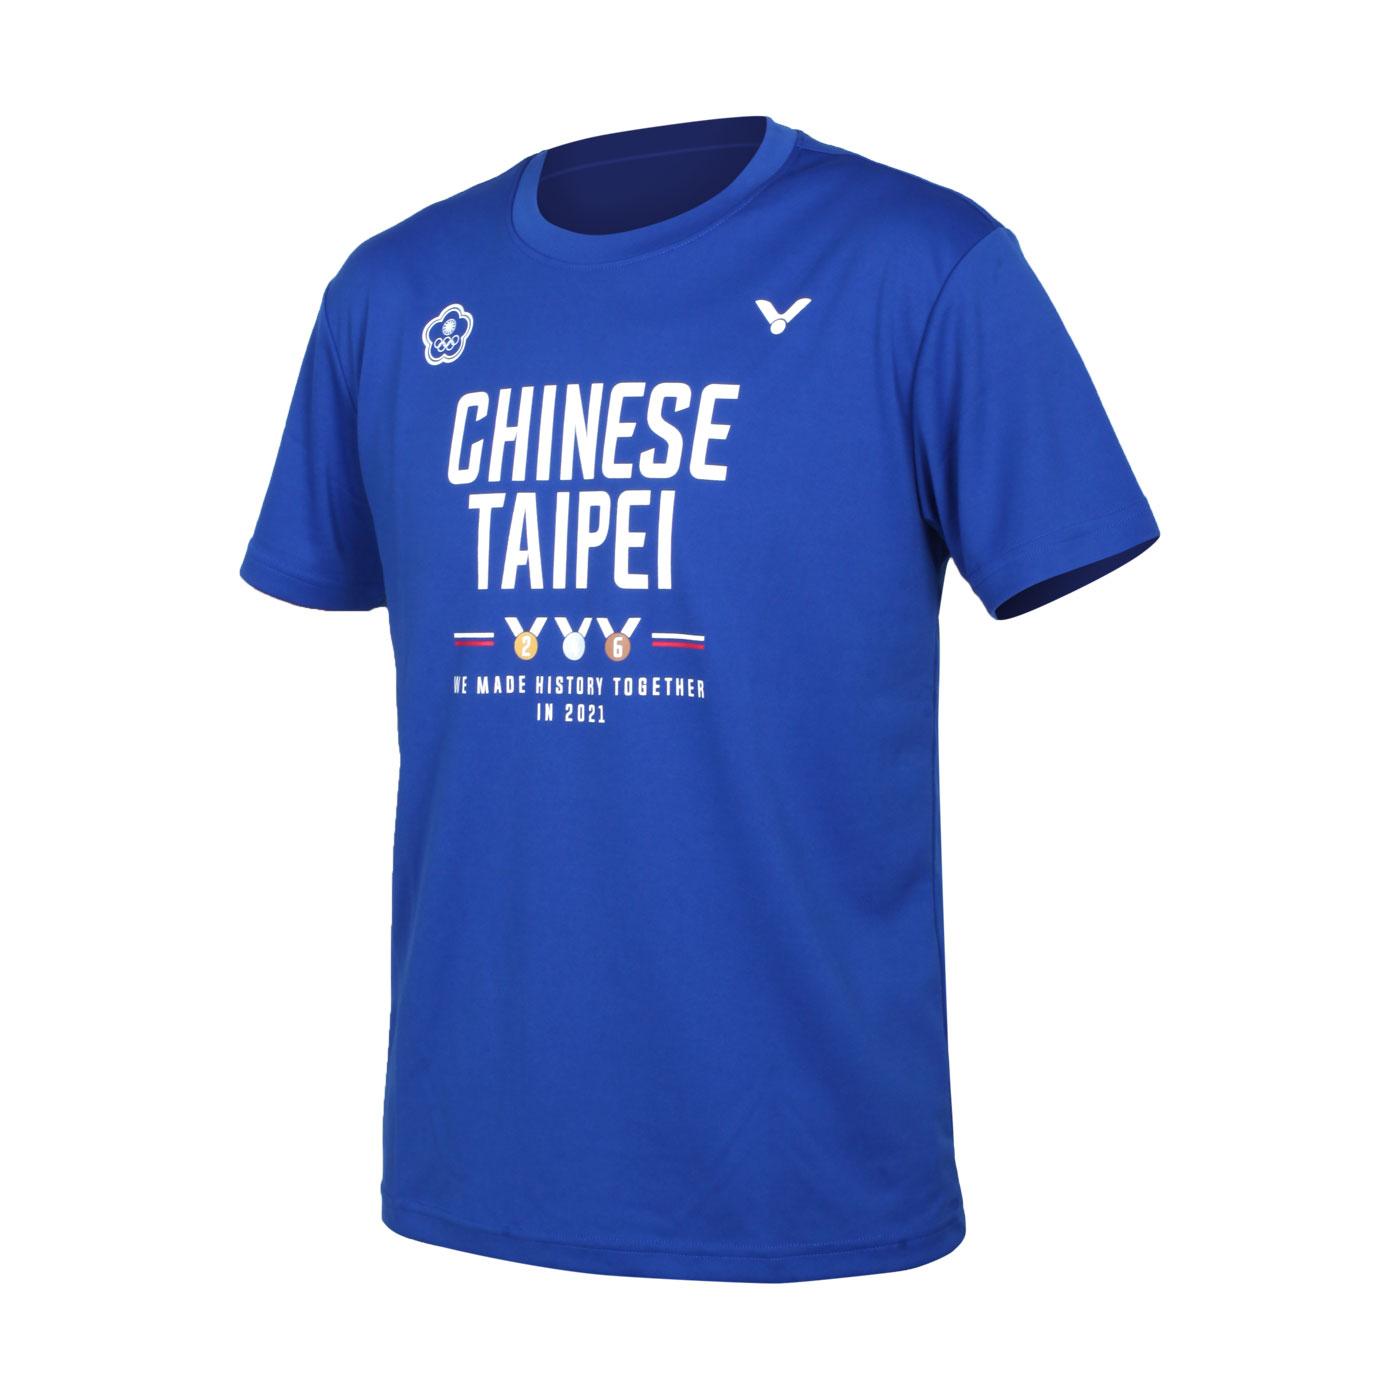 VICTOR 東京奧運中華隊官方紀念短袖T恤 T-2171B - 藍白紅